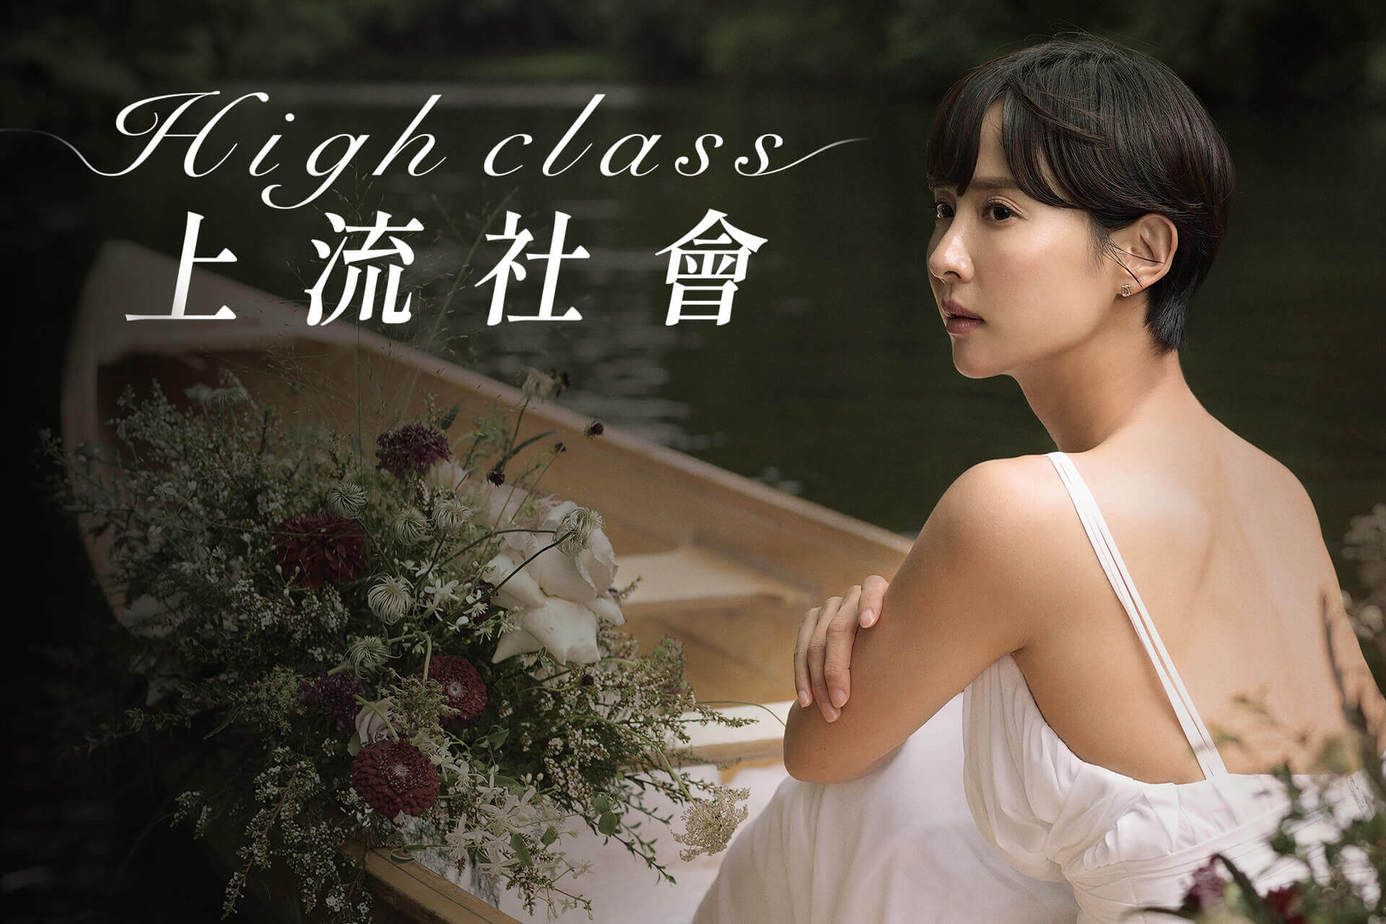 High class上流社會